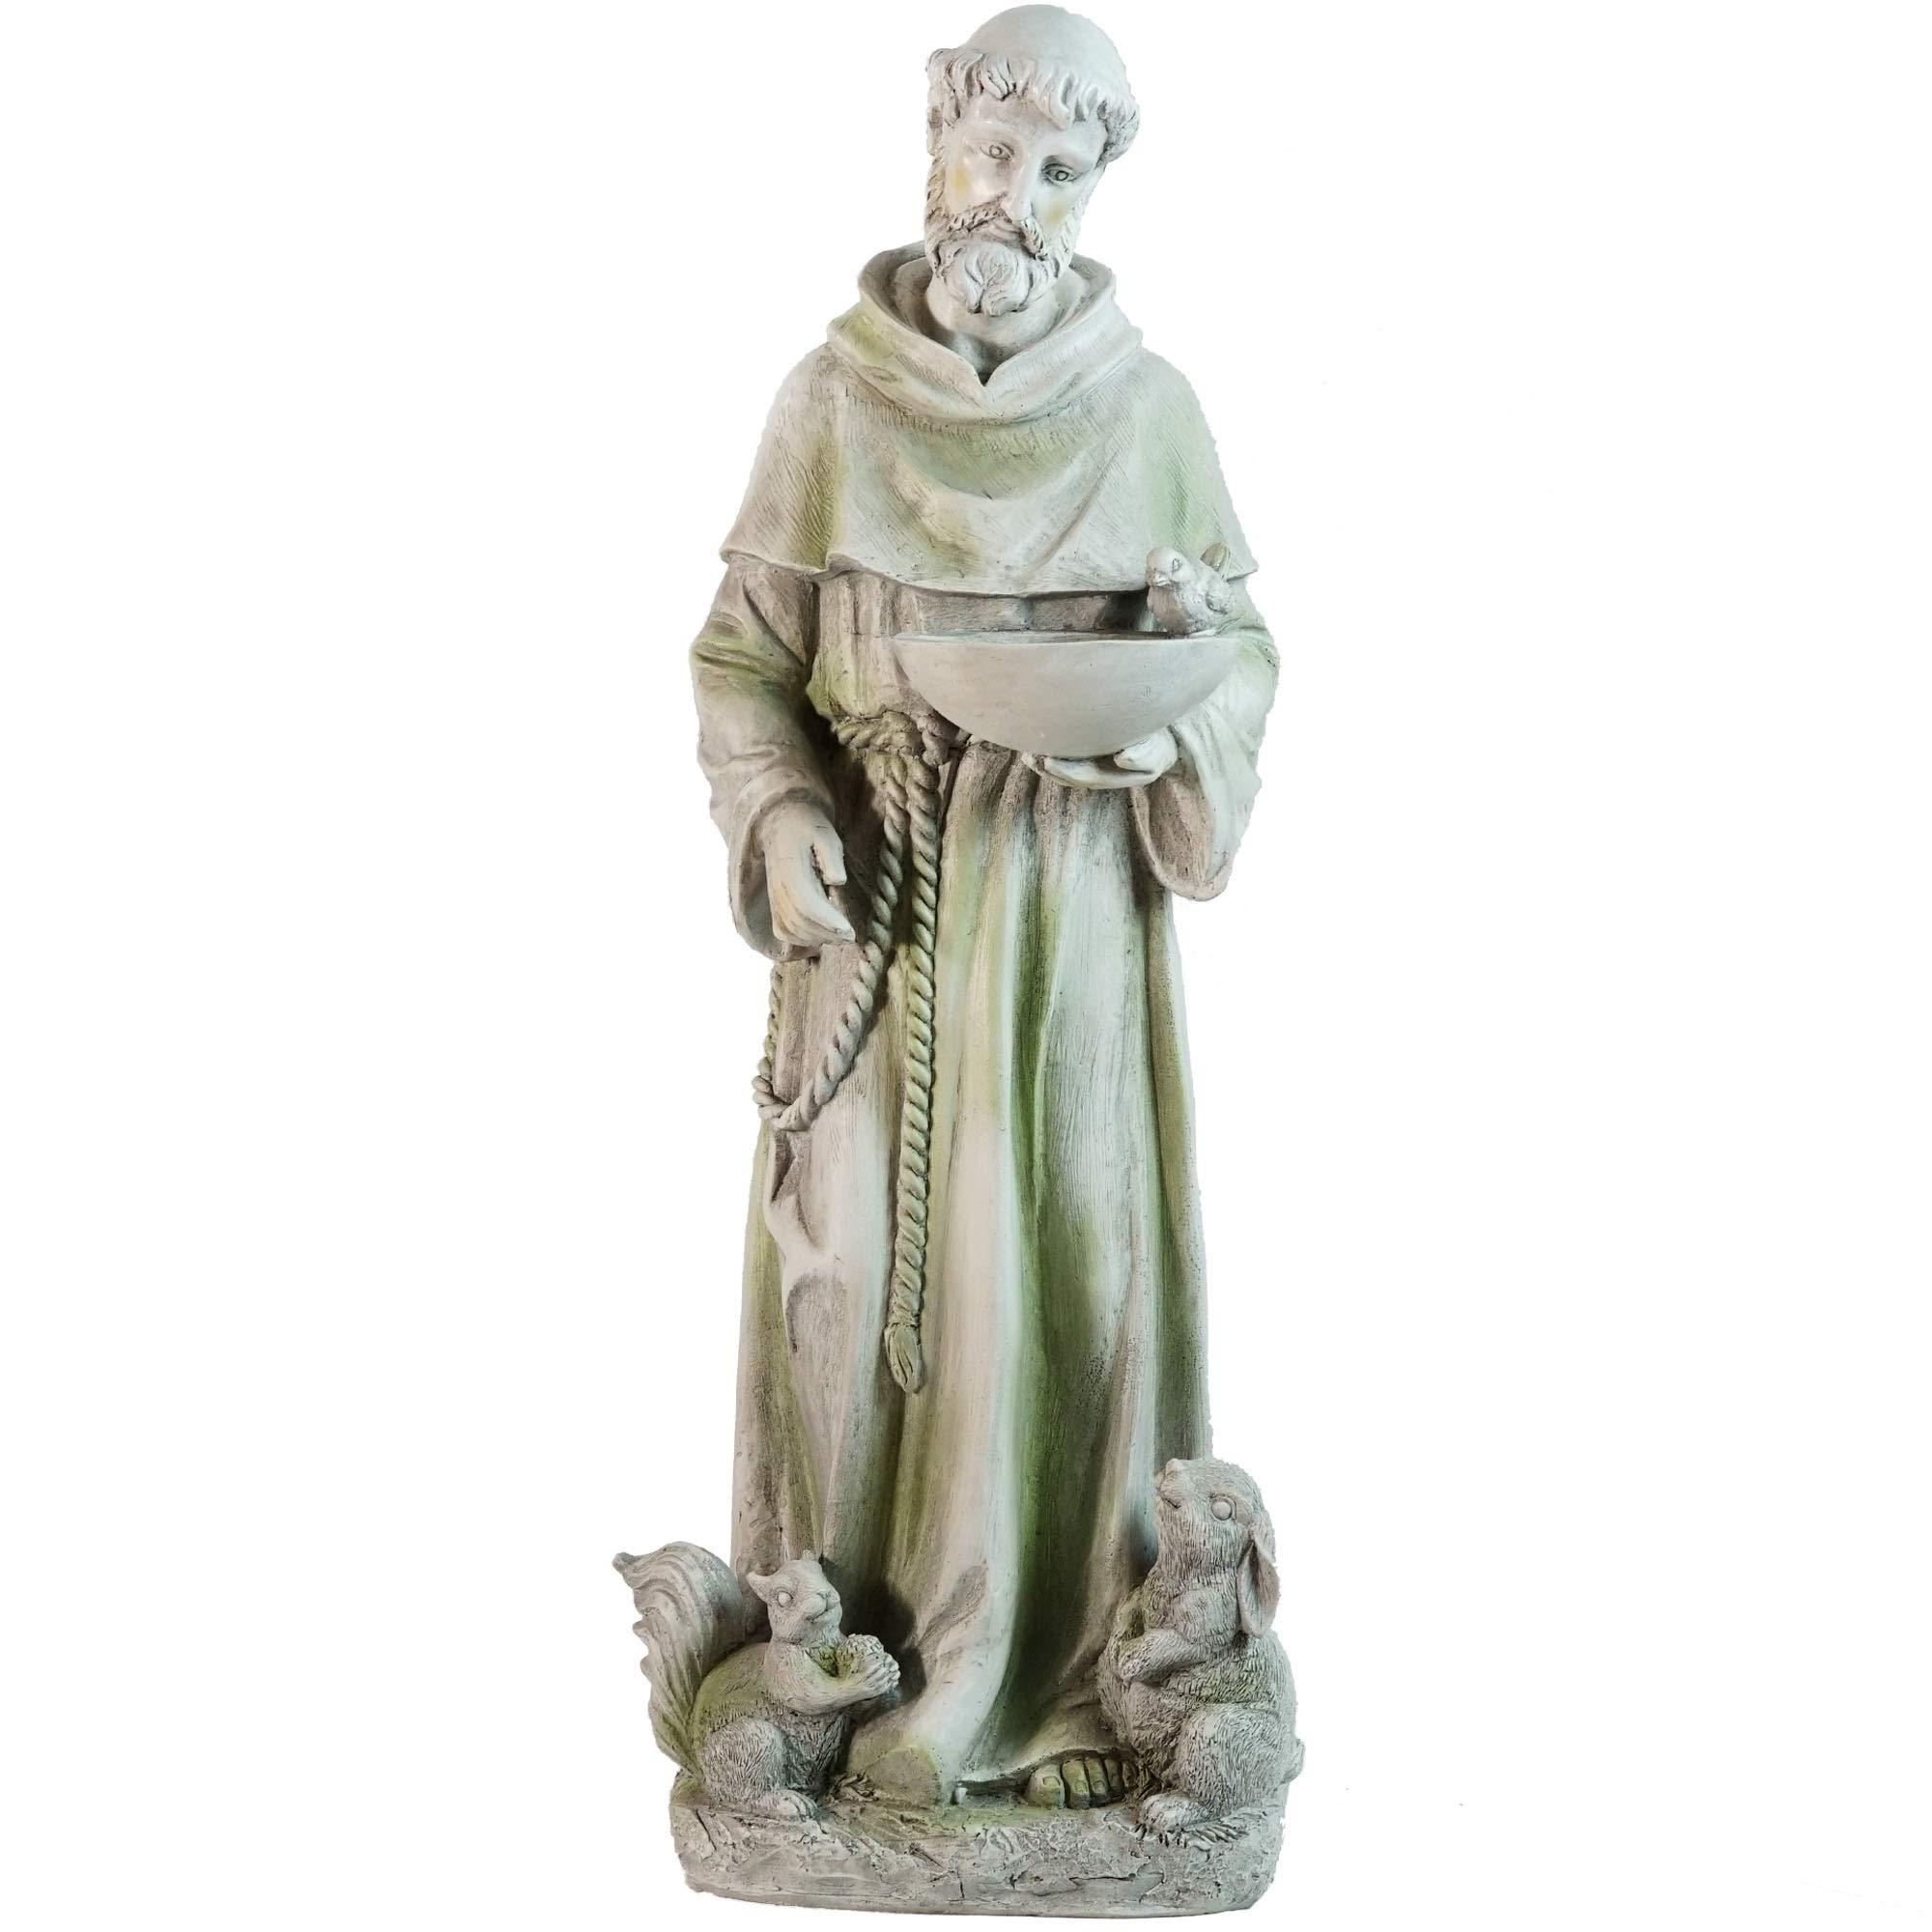 Northlight Standing Religious St. Francis of Assisi Bird Feeder Outdoor Garden Statue, 23.5'', Gray